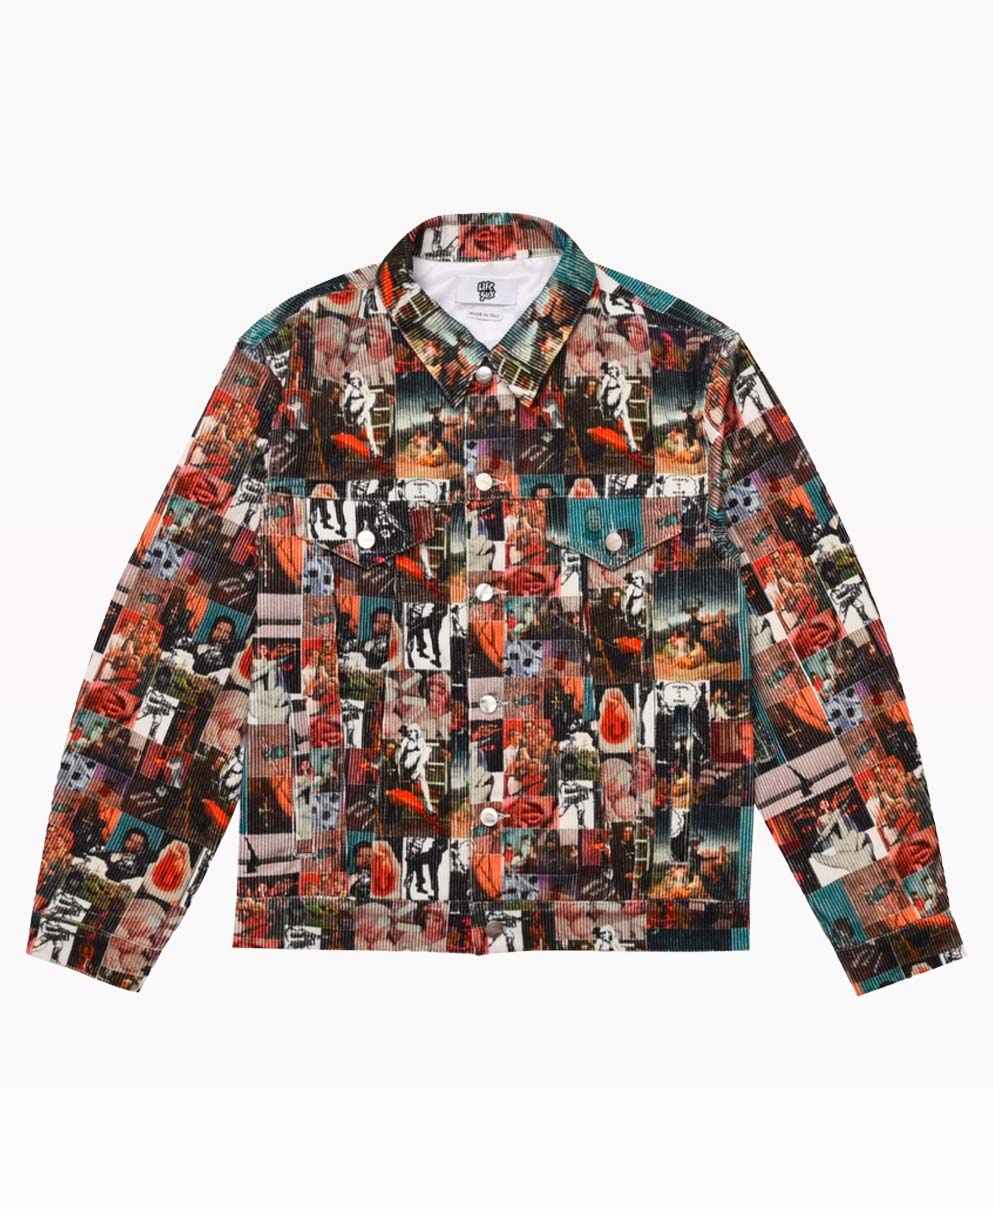 Lifesux Corduroy Jacket Front